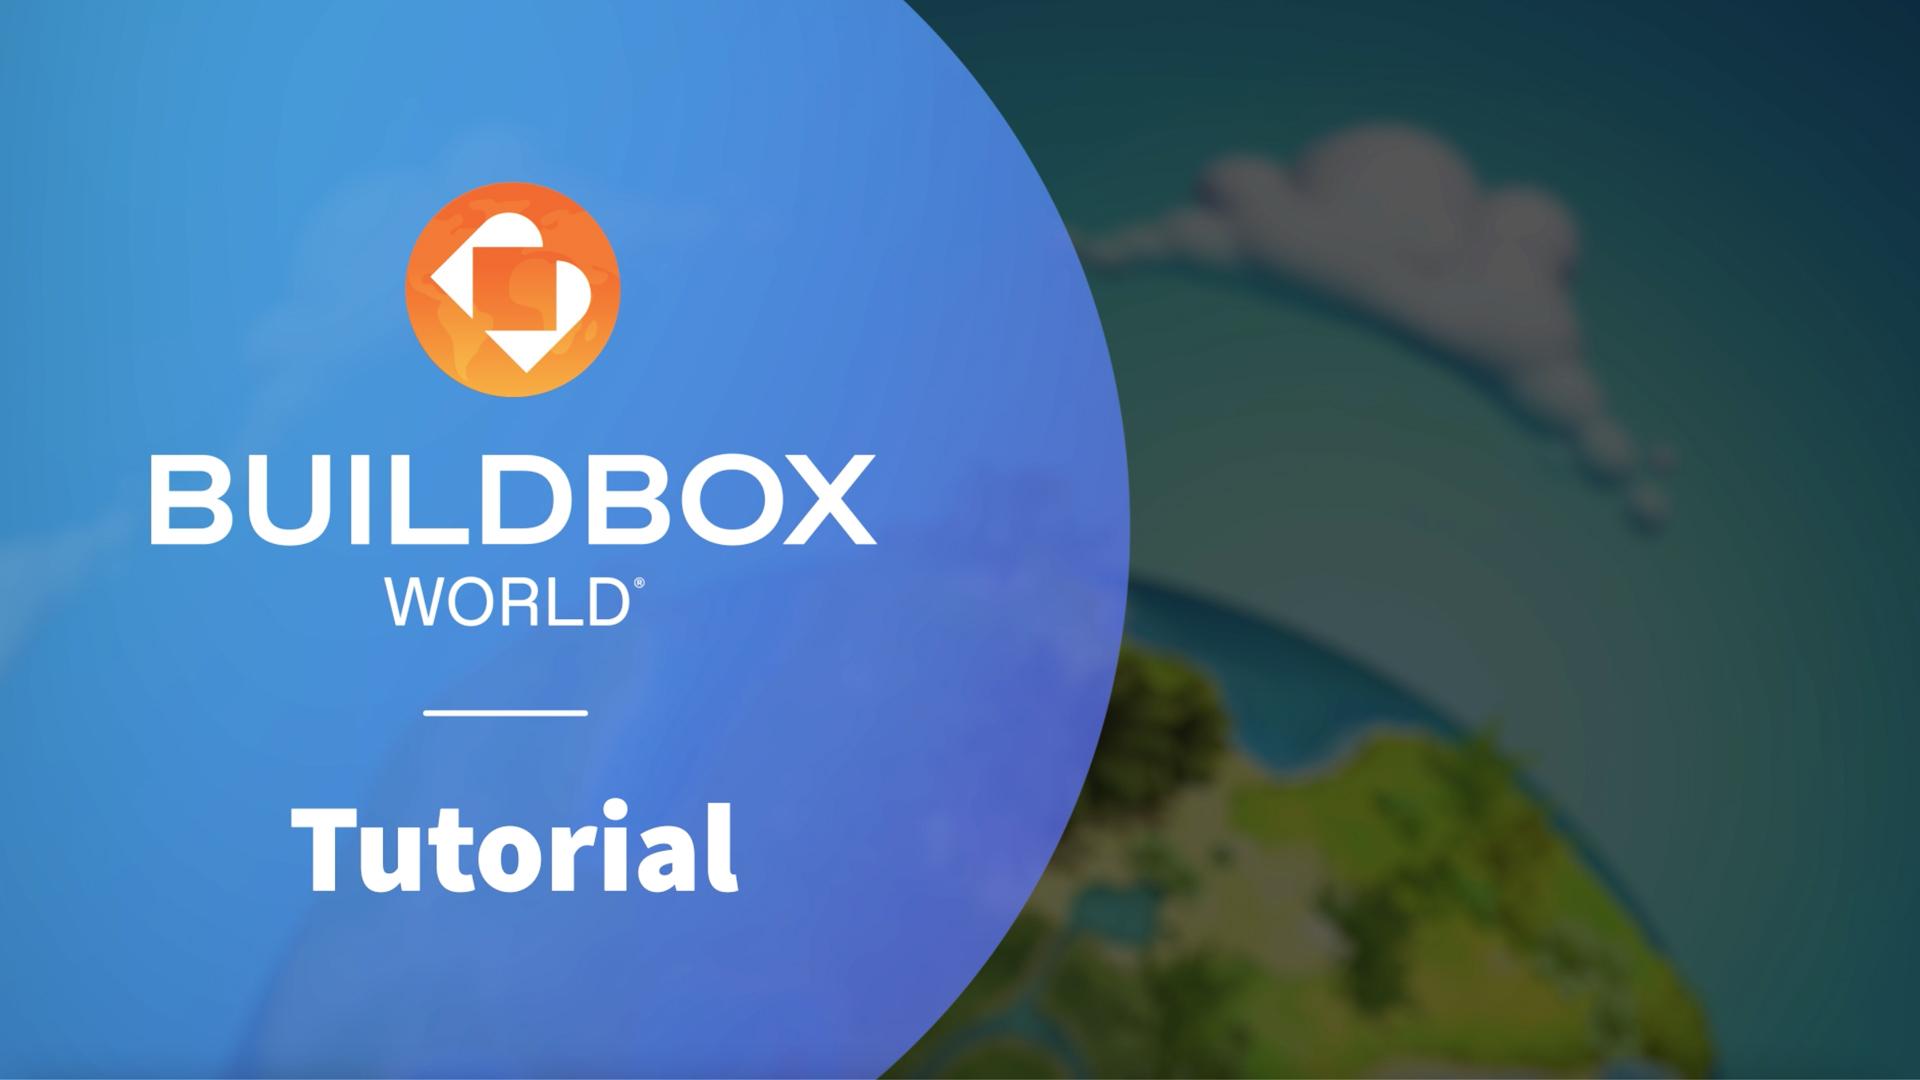 Buildbox World Tutorial